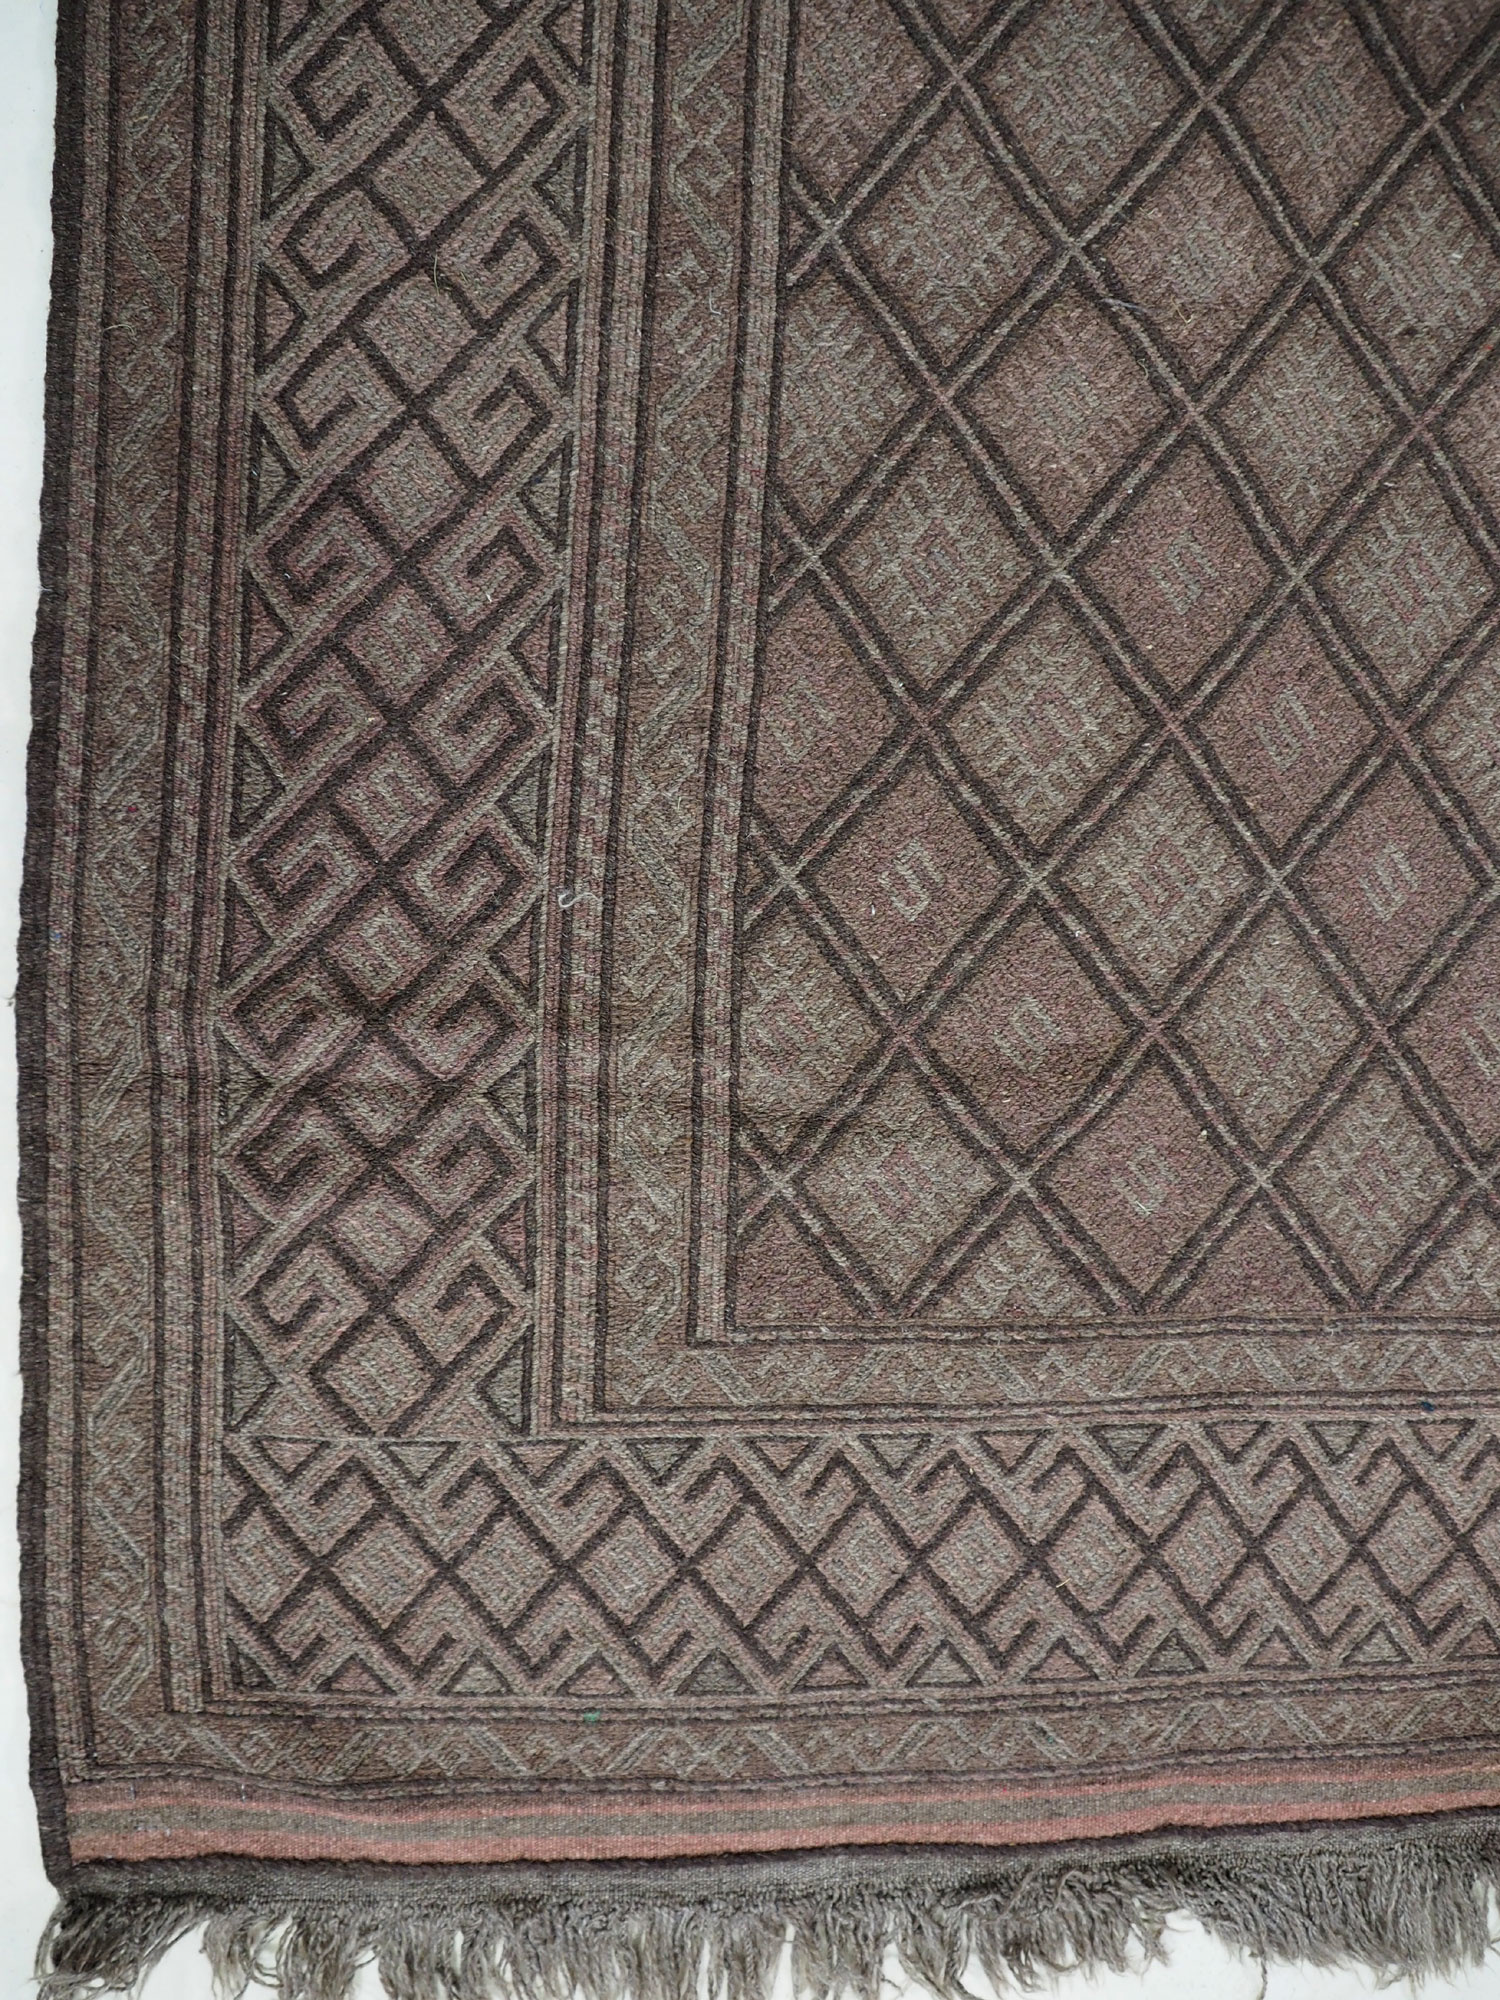 258x180 cm  sumakh kelim Taimani Balouch Süd-Afghanistan Nr-TM-7